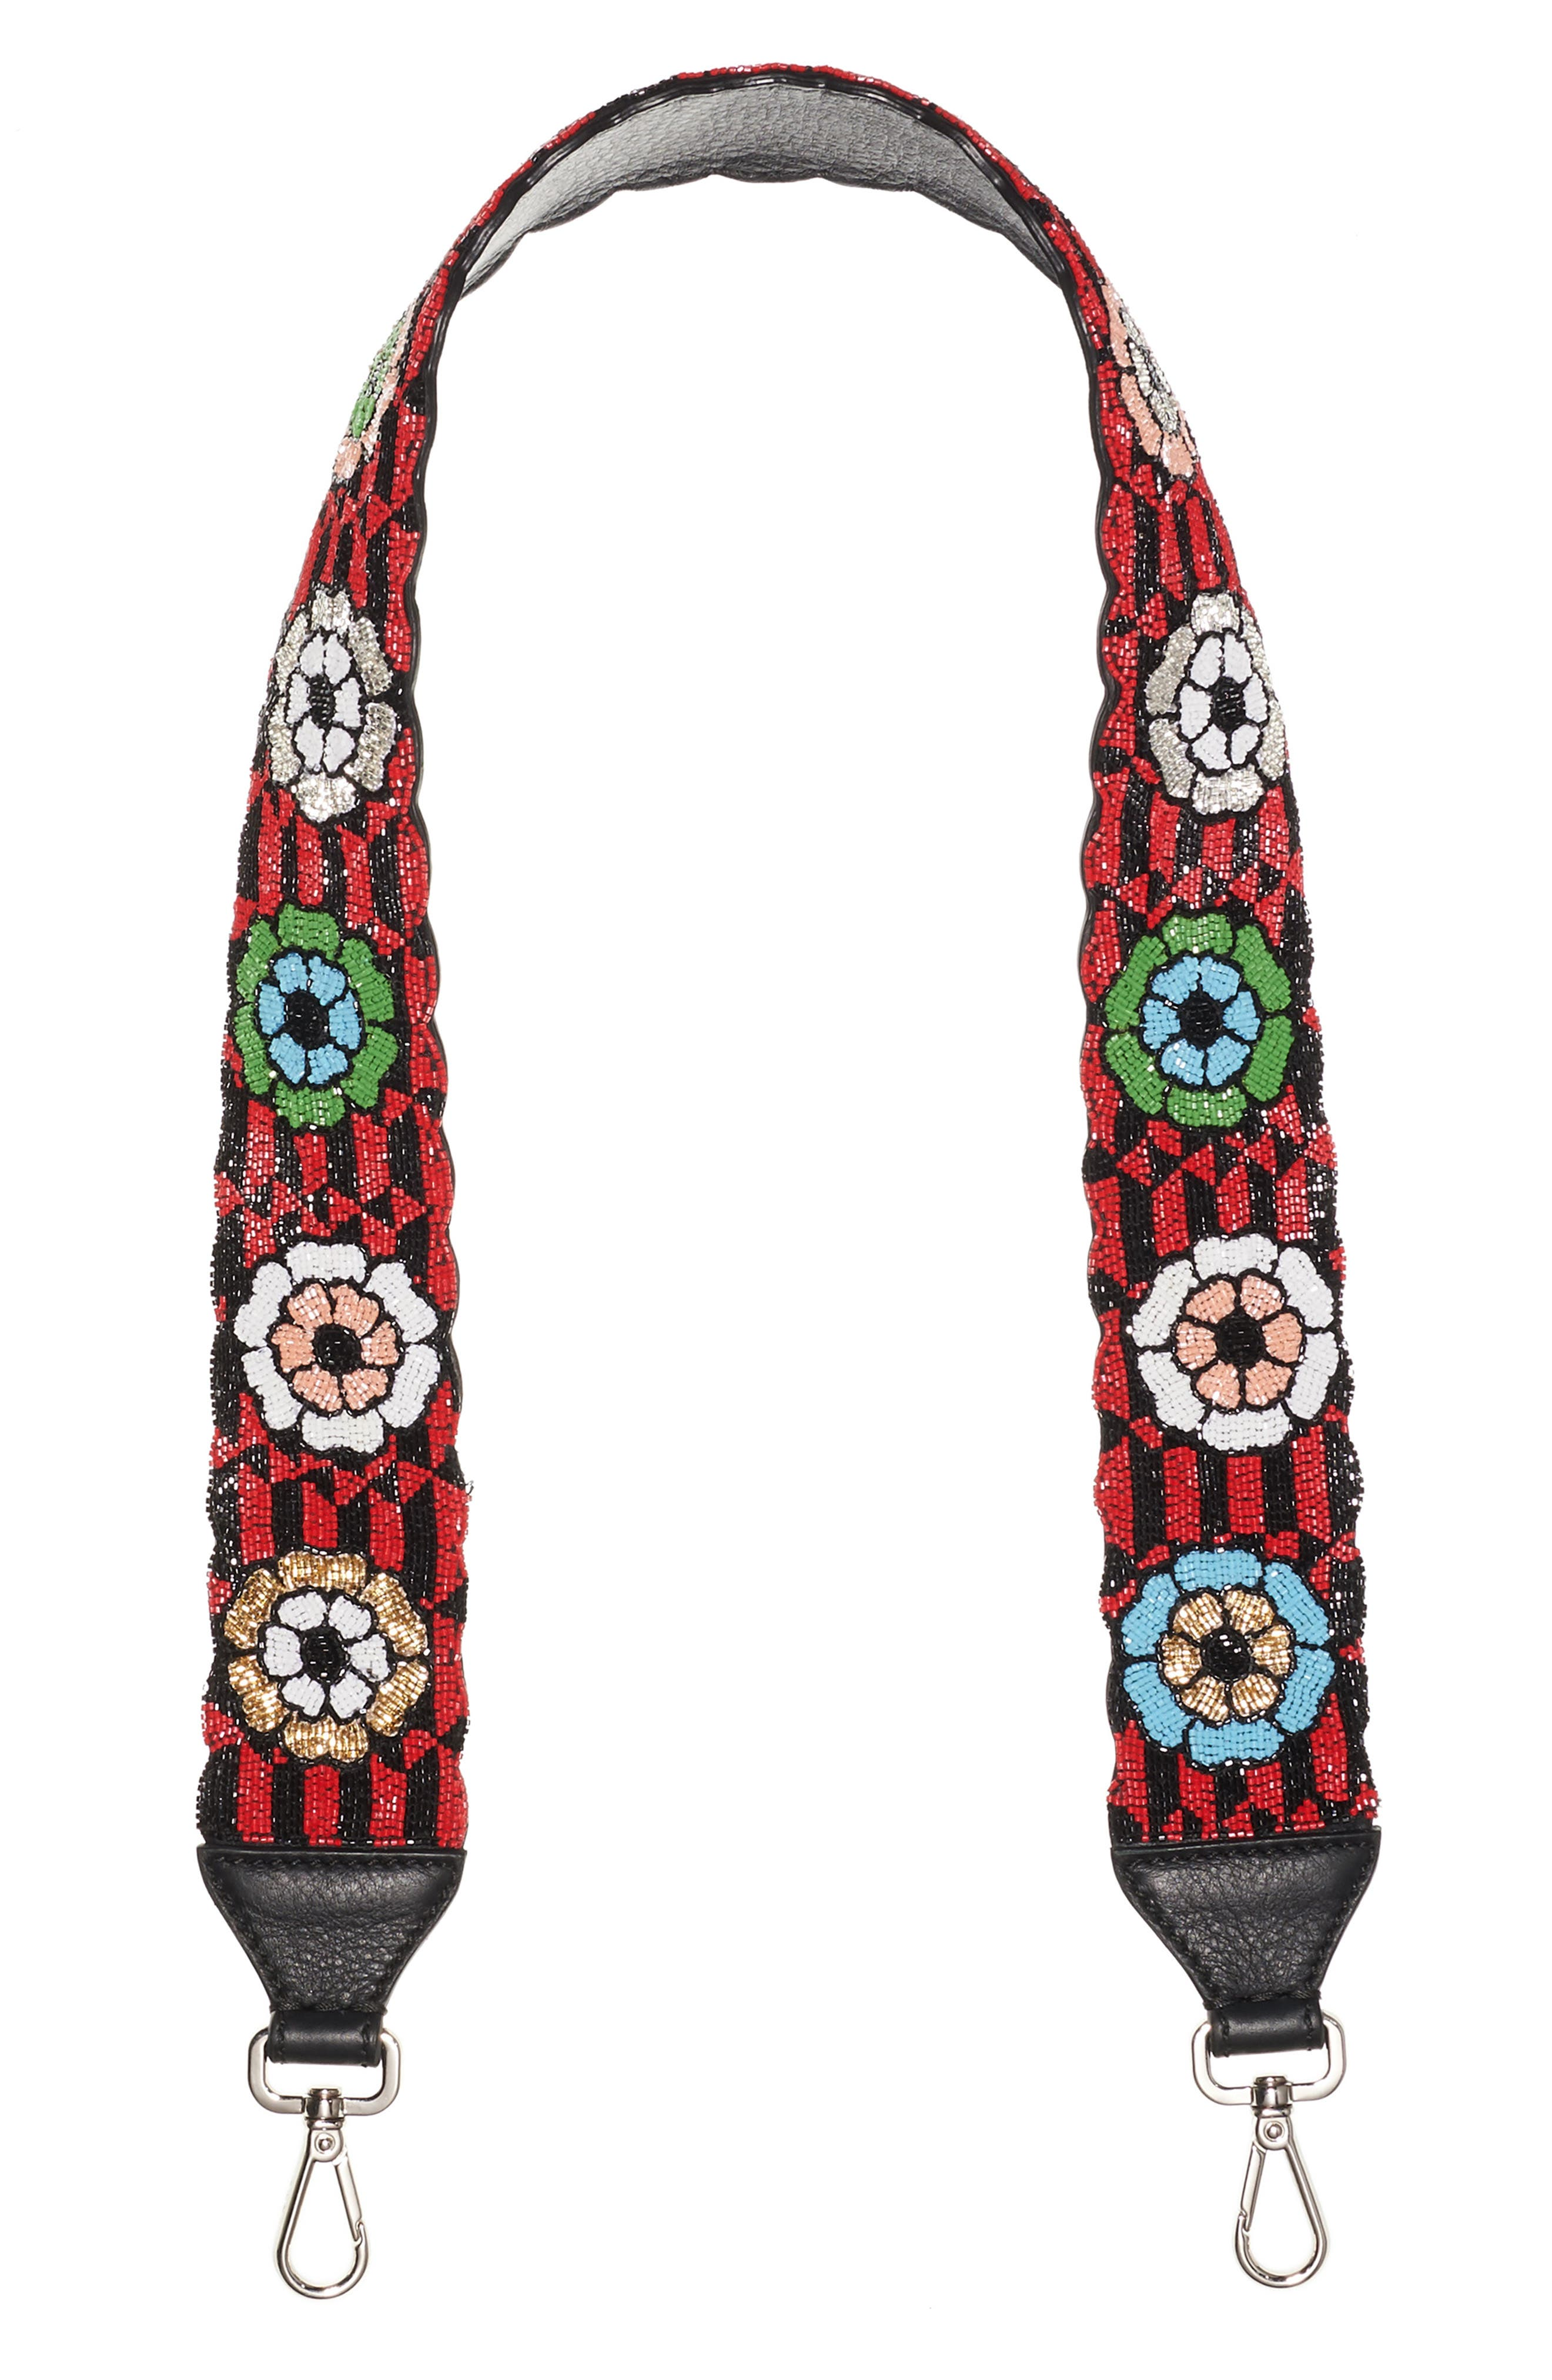 Beaded Flower Guitar Bag Strap,                             Main thumbnail 1, color,                             610